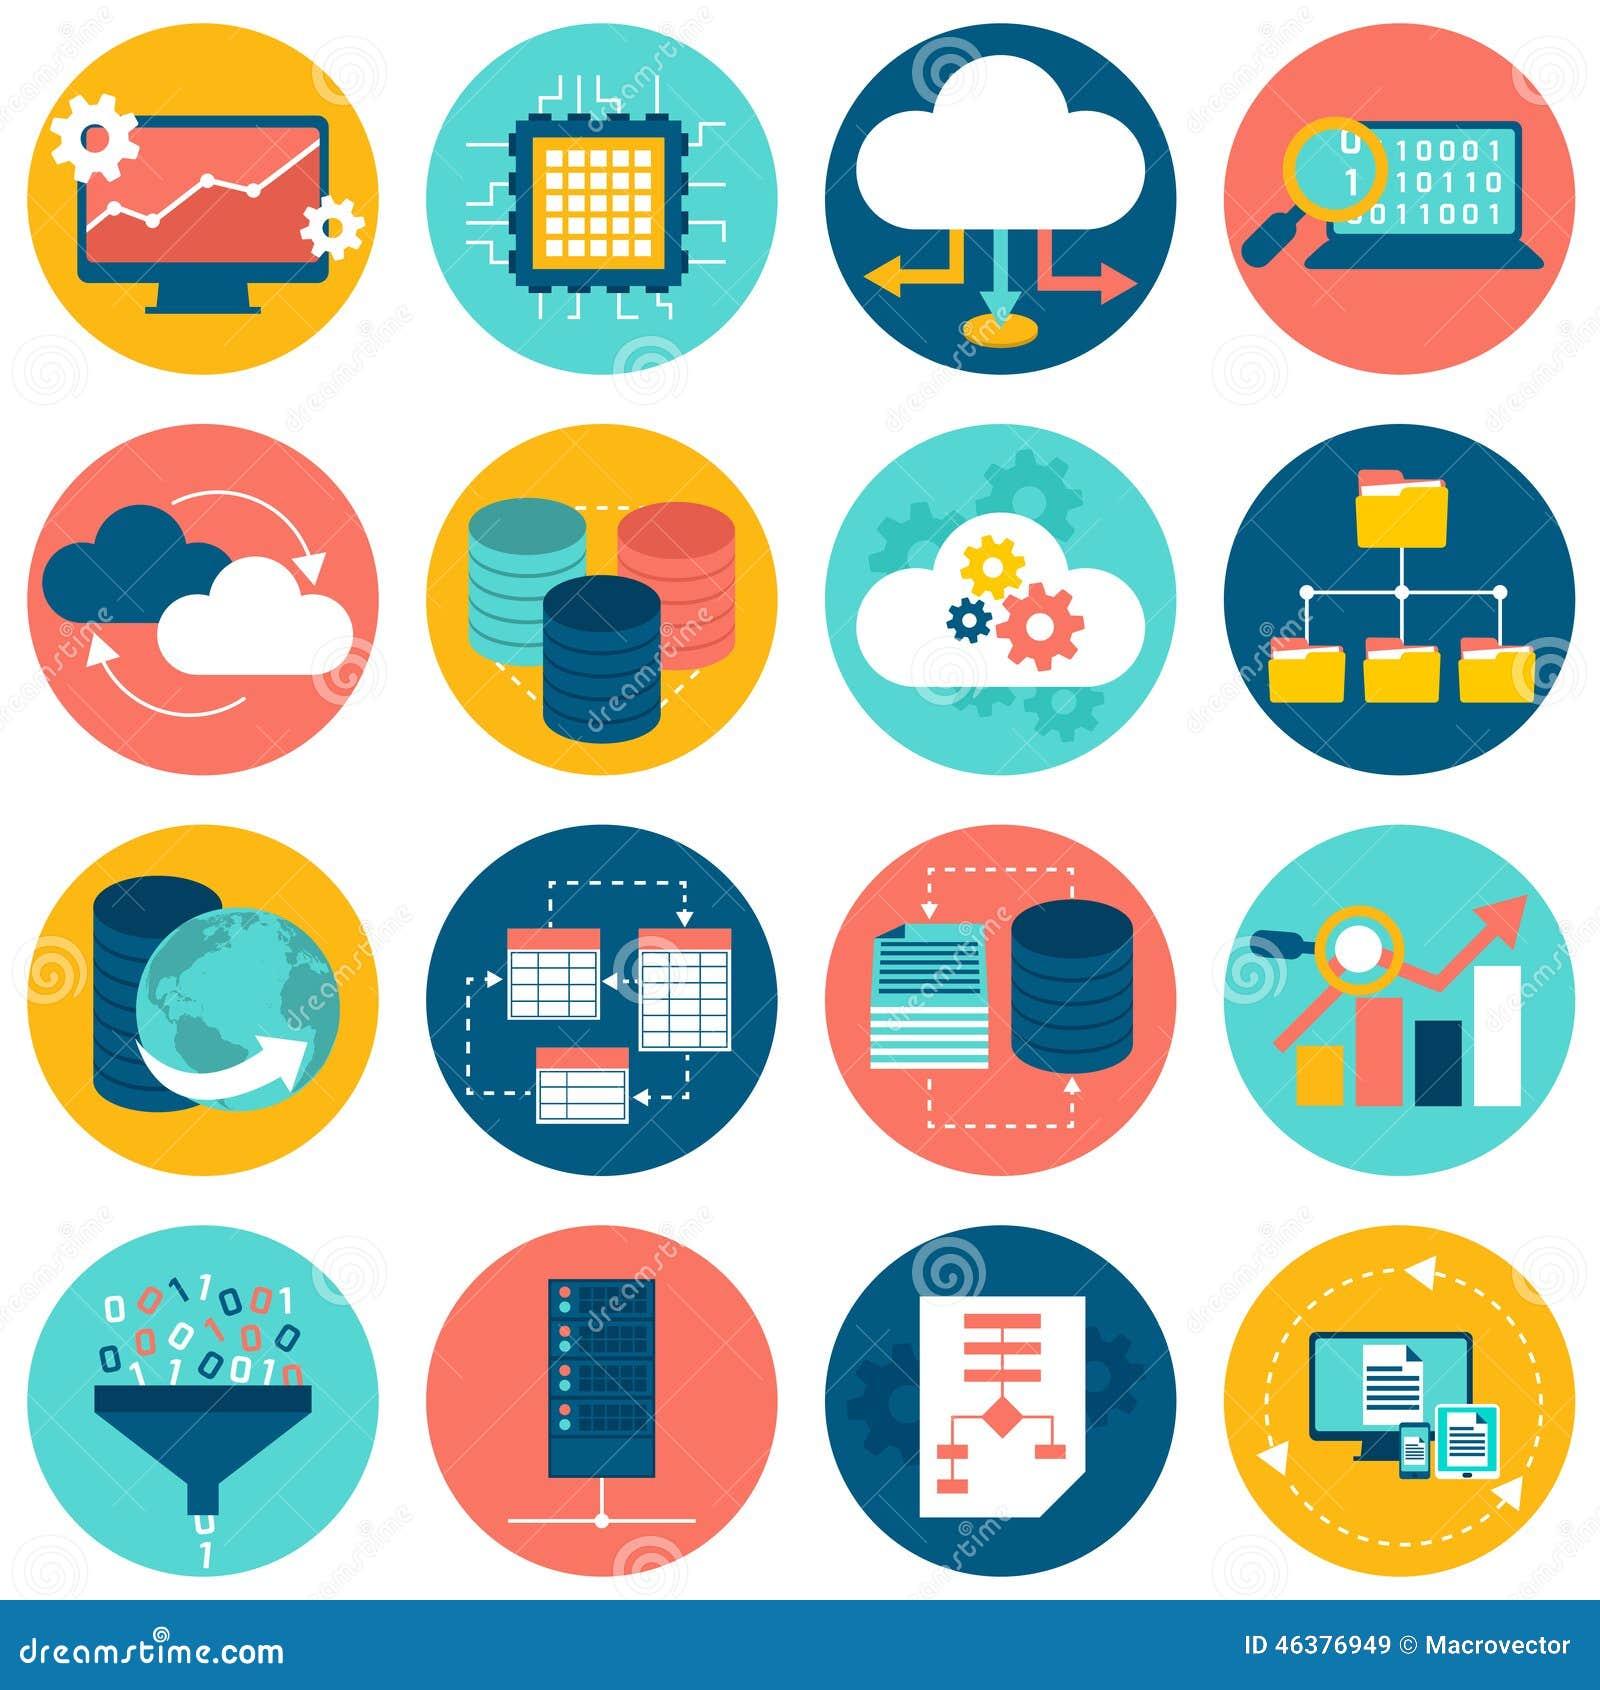 Data Analysis Icons Stock Vector - Image: 46376949